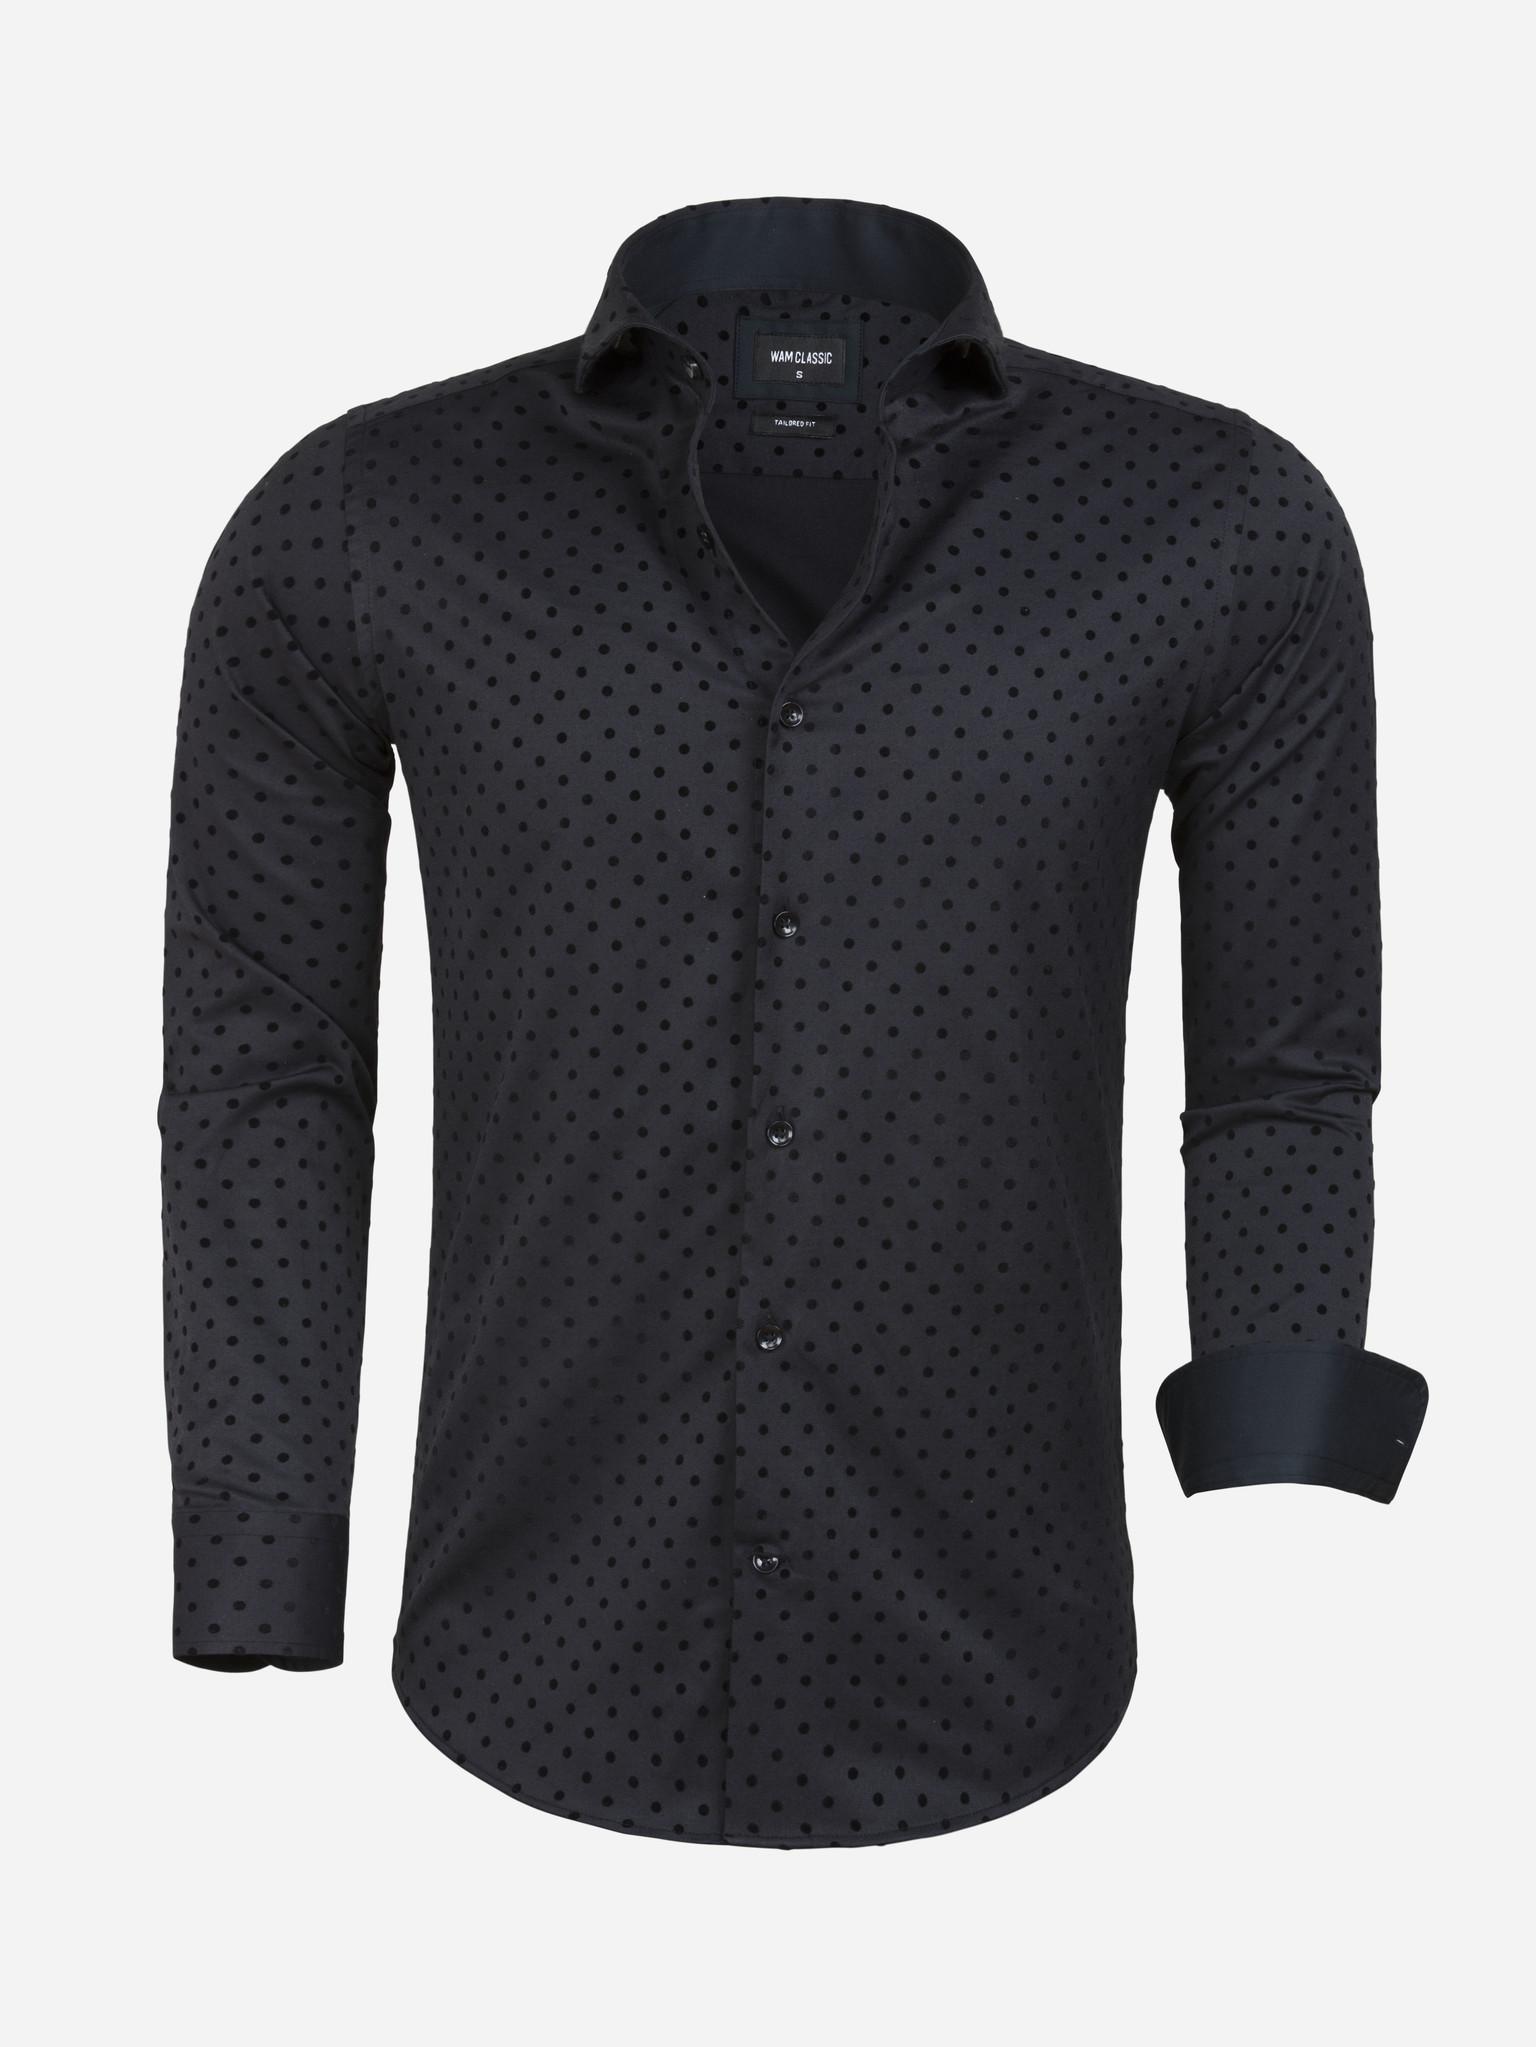 Wam Denim Overhemd Lange Mouw Cartaxo Black Maat: XL